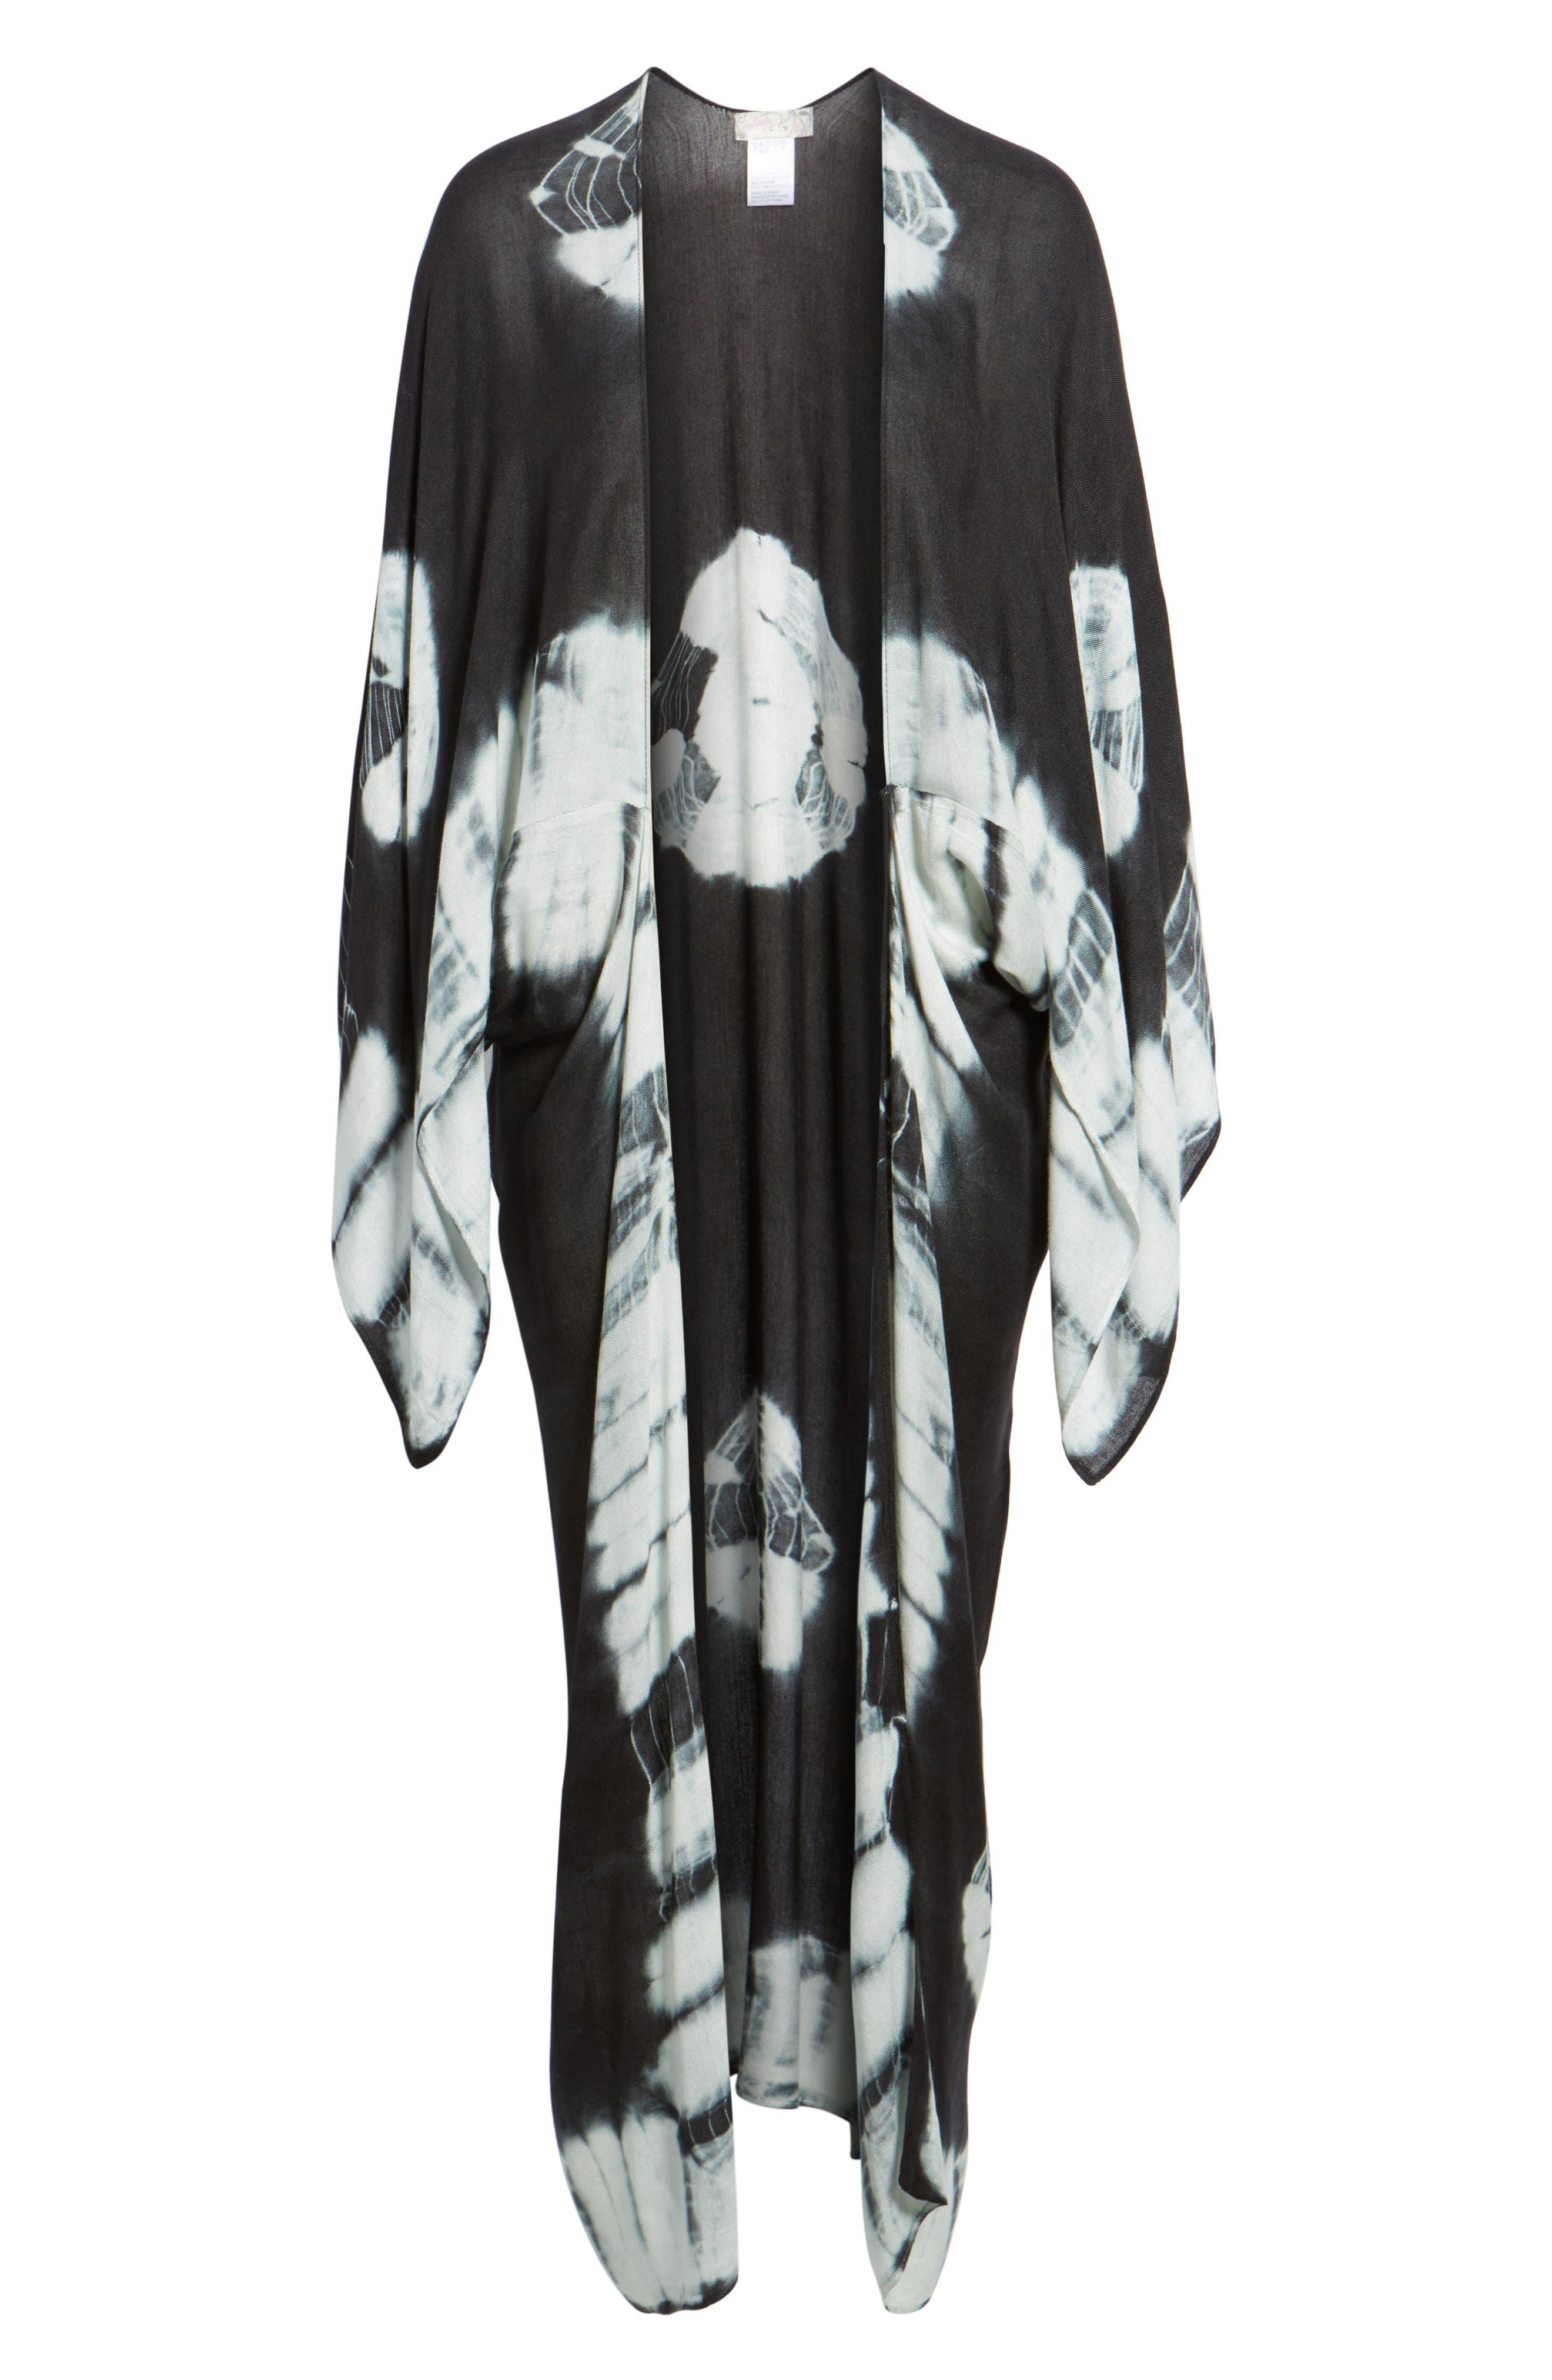 Spellbound Tie Dye Kimono Duster,                             Alternate thumbnail 6, color,                             Black